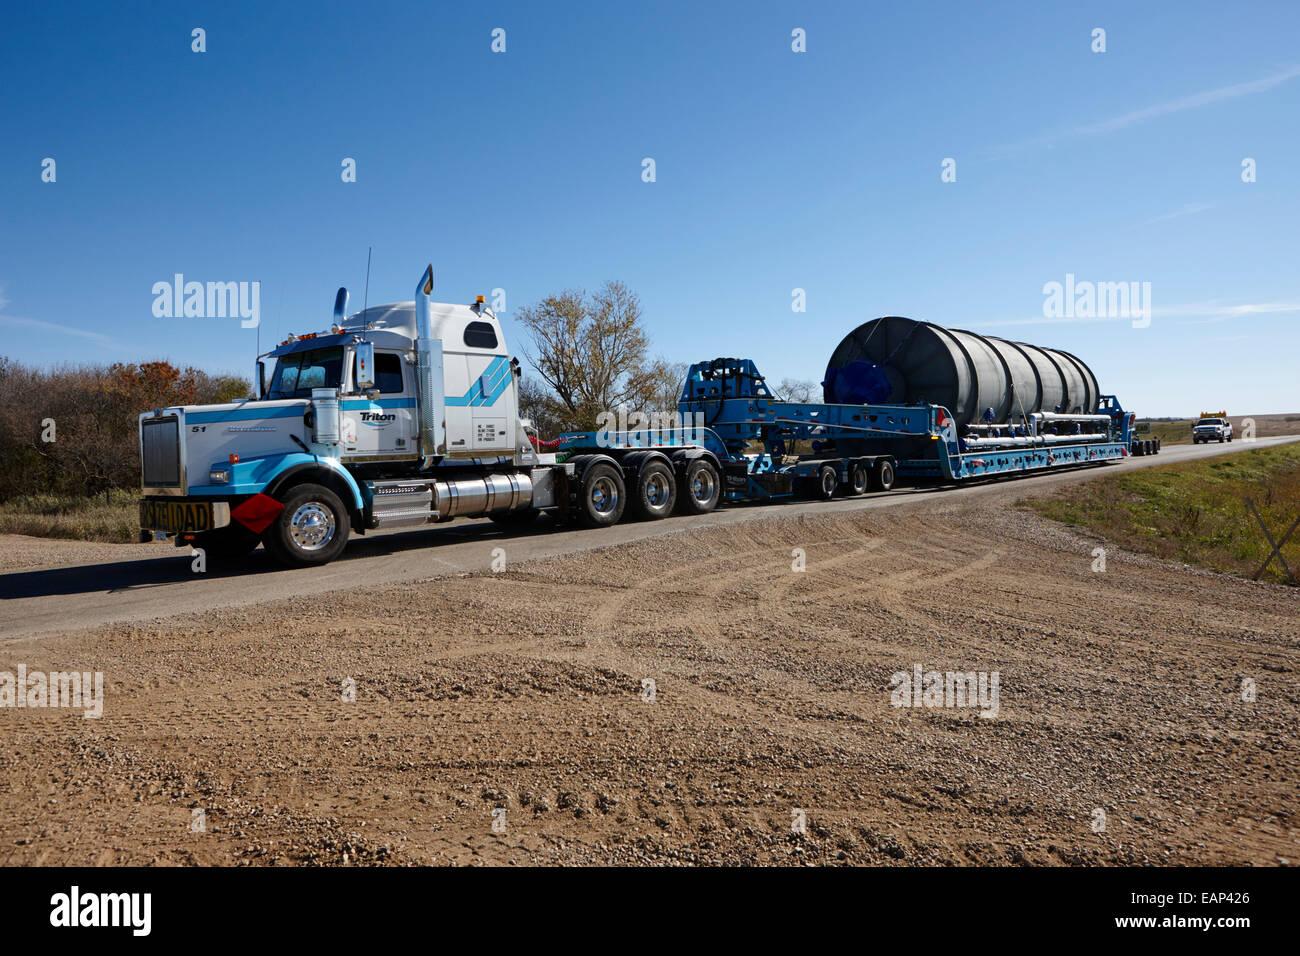 oversize load transporting a grain silo on local rural road Saskatchewan Canada - Stock Image